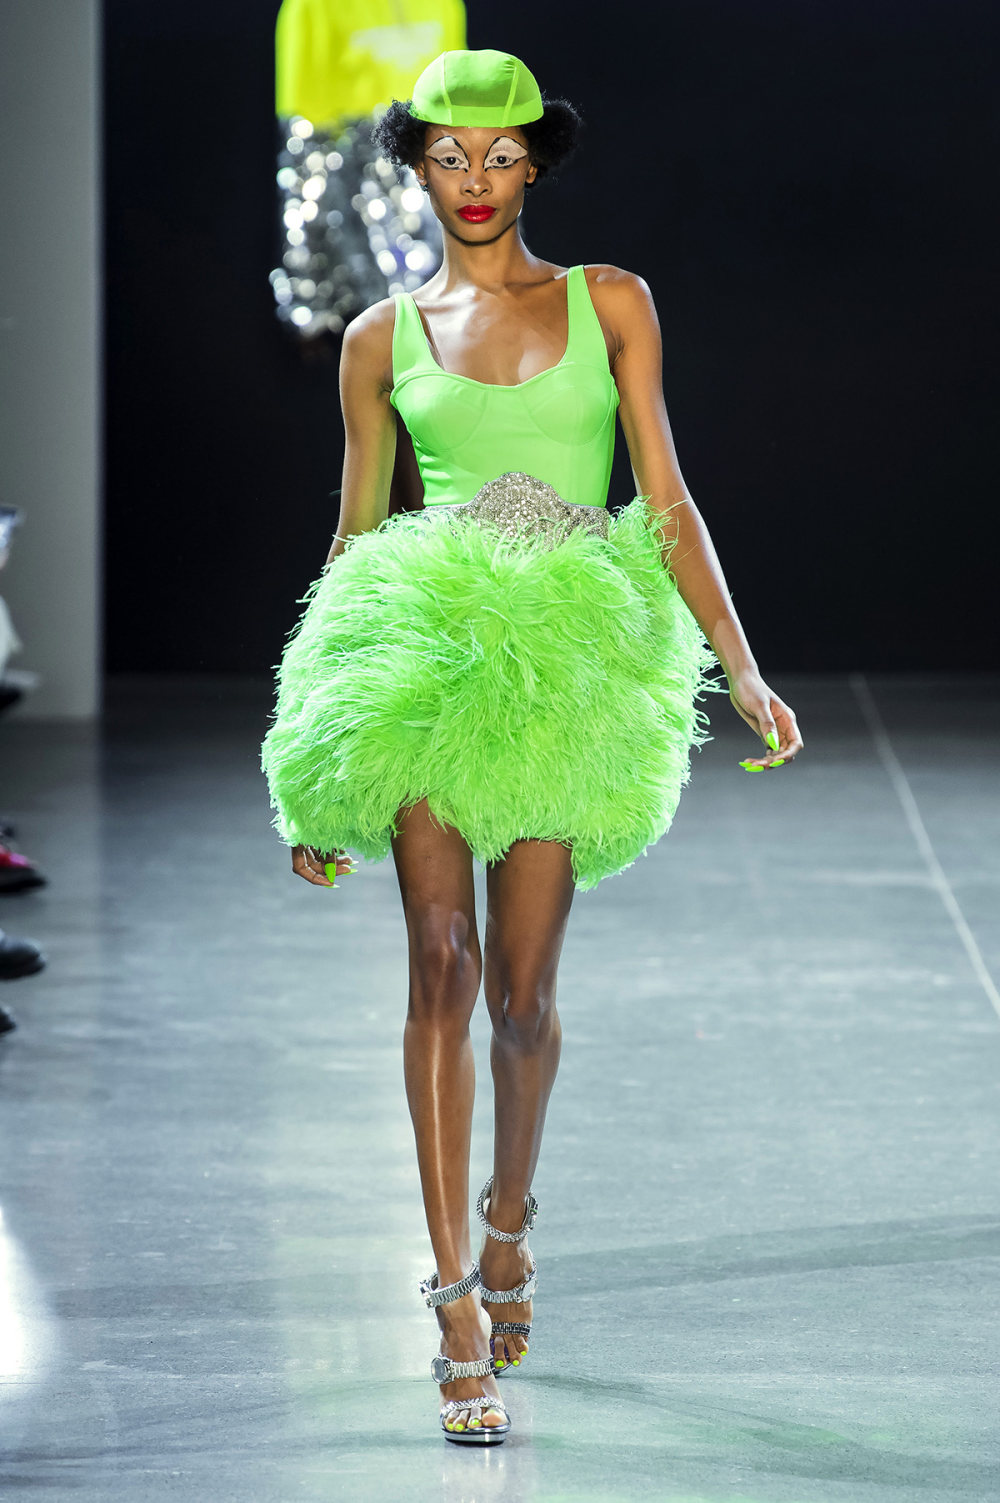 Christian Cowan时装系列虽然巨大的薄纱层状服装并没有那么特别-13.jpg